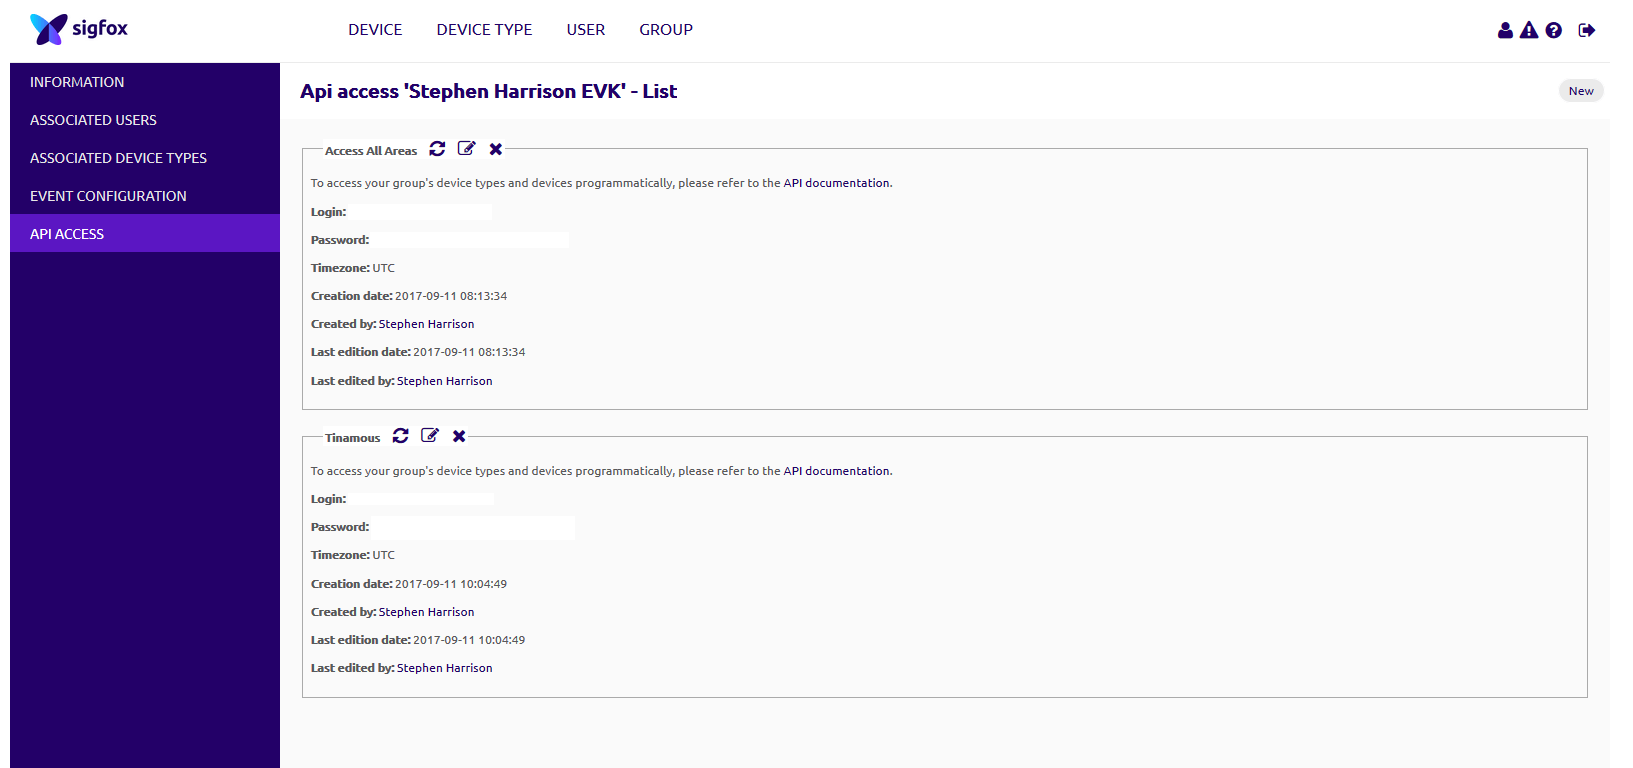 Sigfox API Access